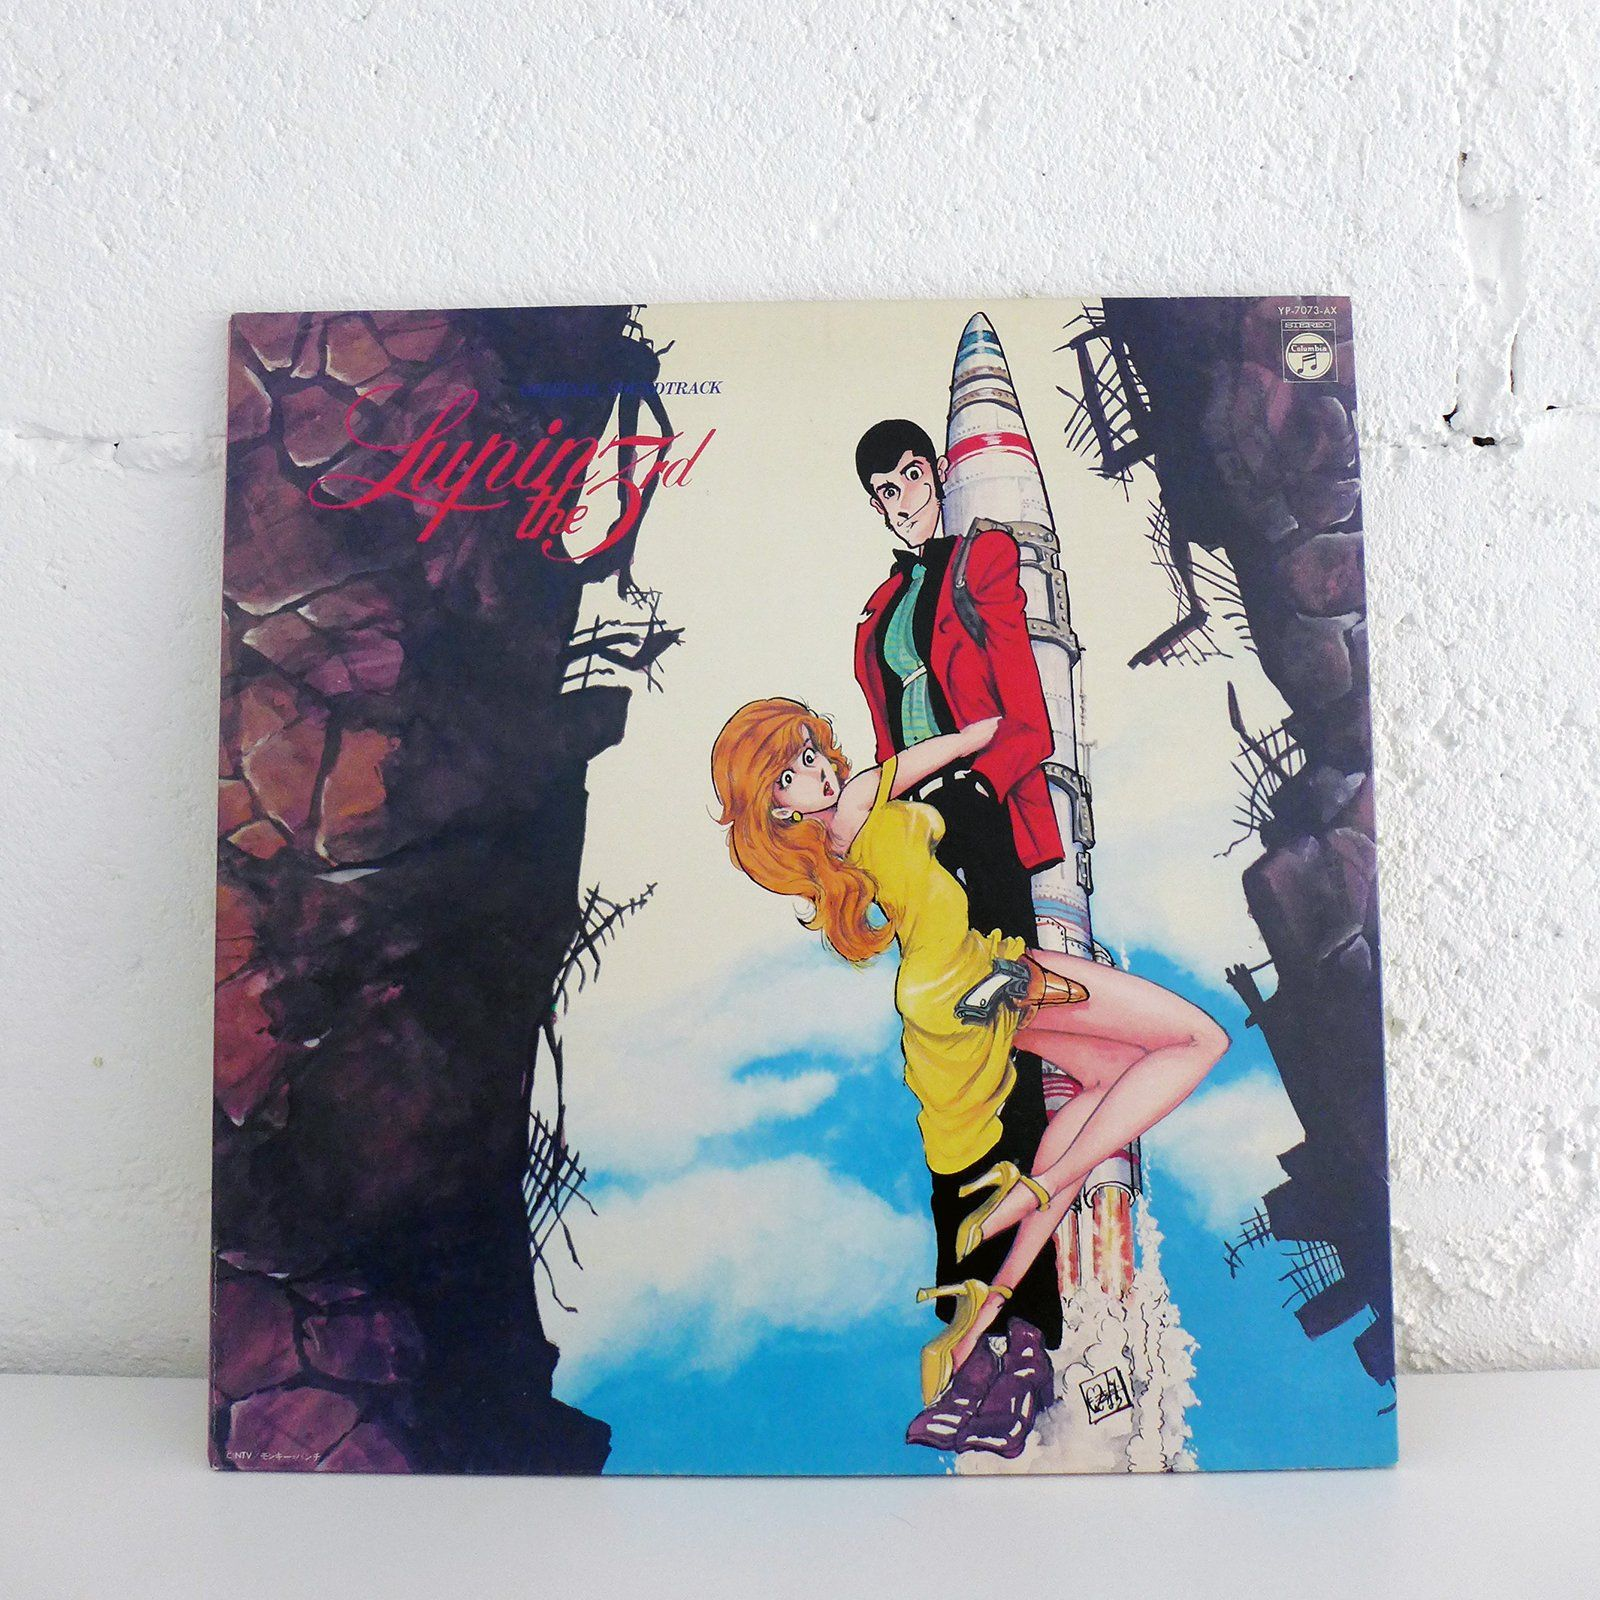 Anime Lupin The 3rd 3 Original Soundtrack Vintage Vinyl